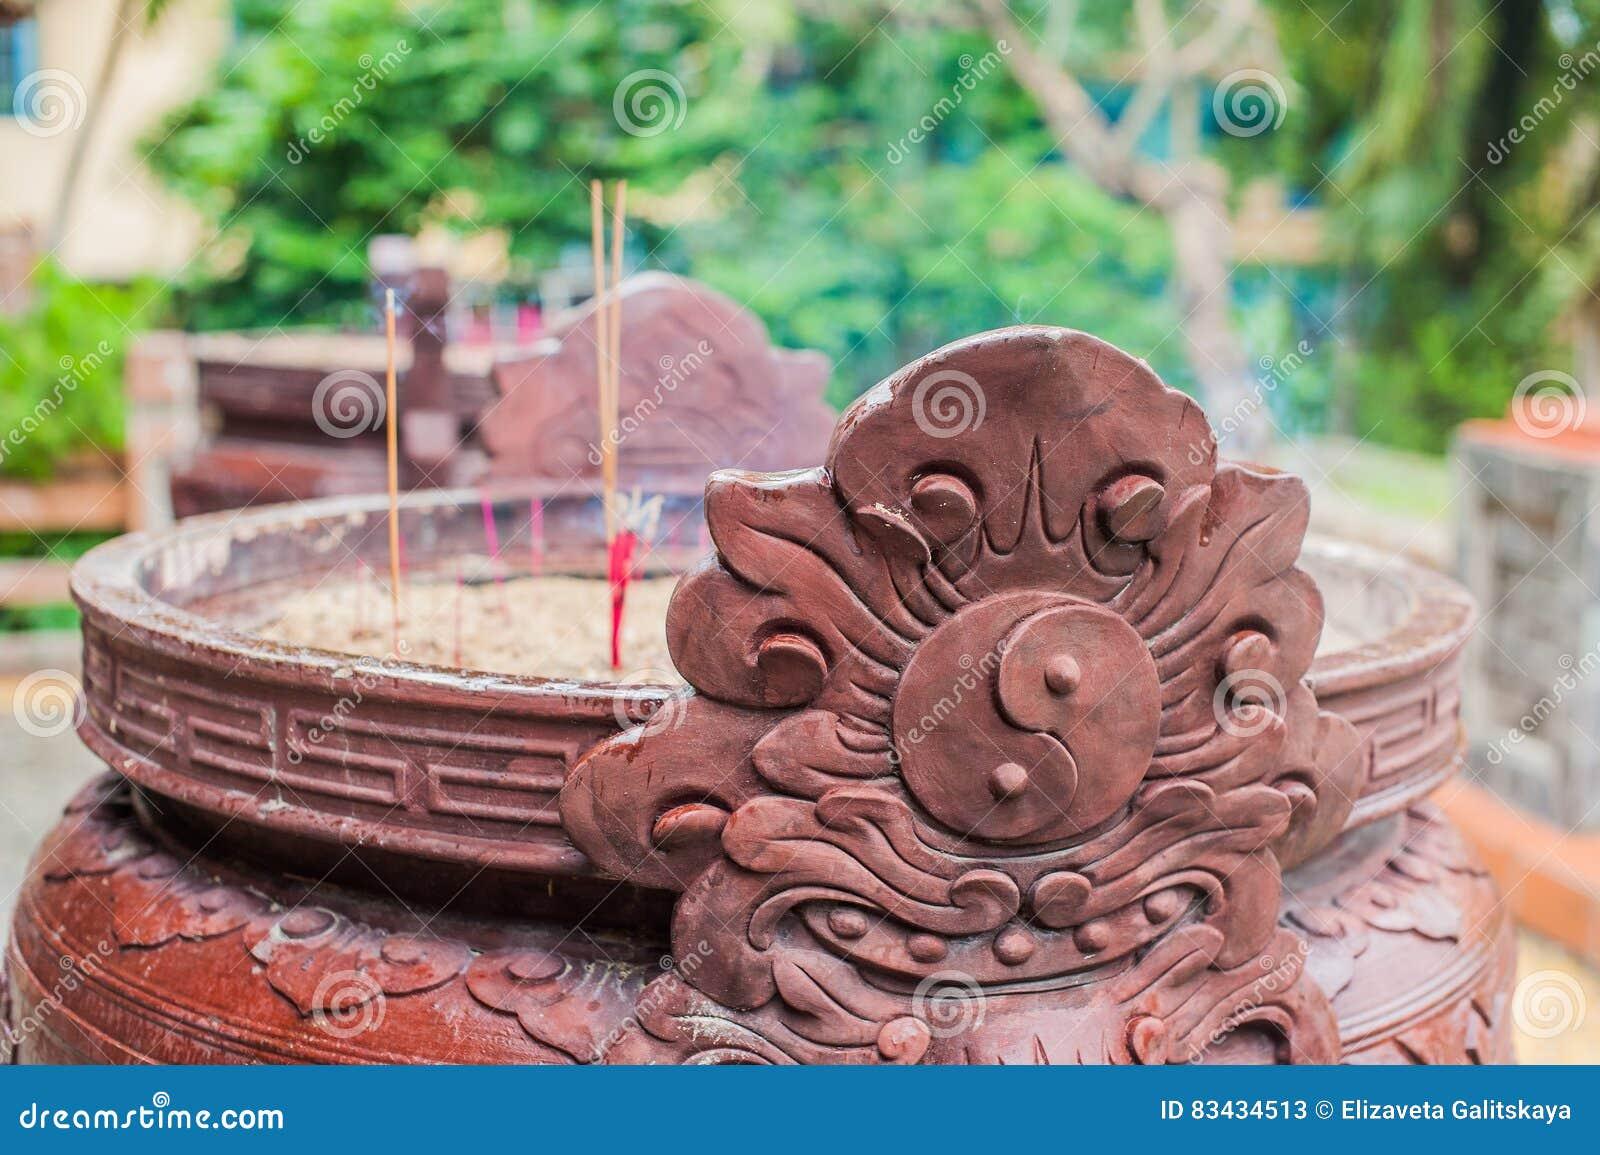 Buddhist Prayer Sticks Inside Temple Stock Image - Image of